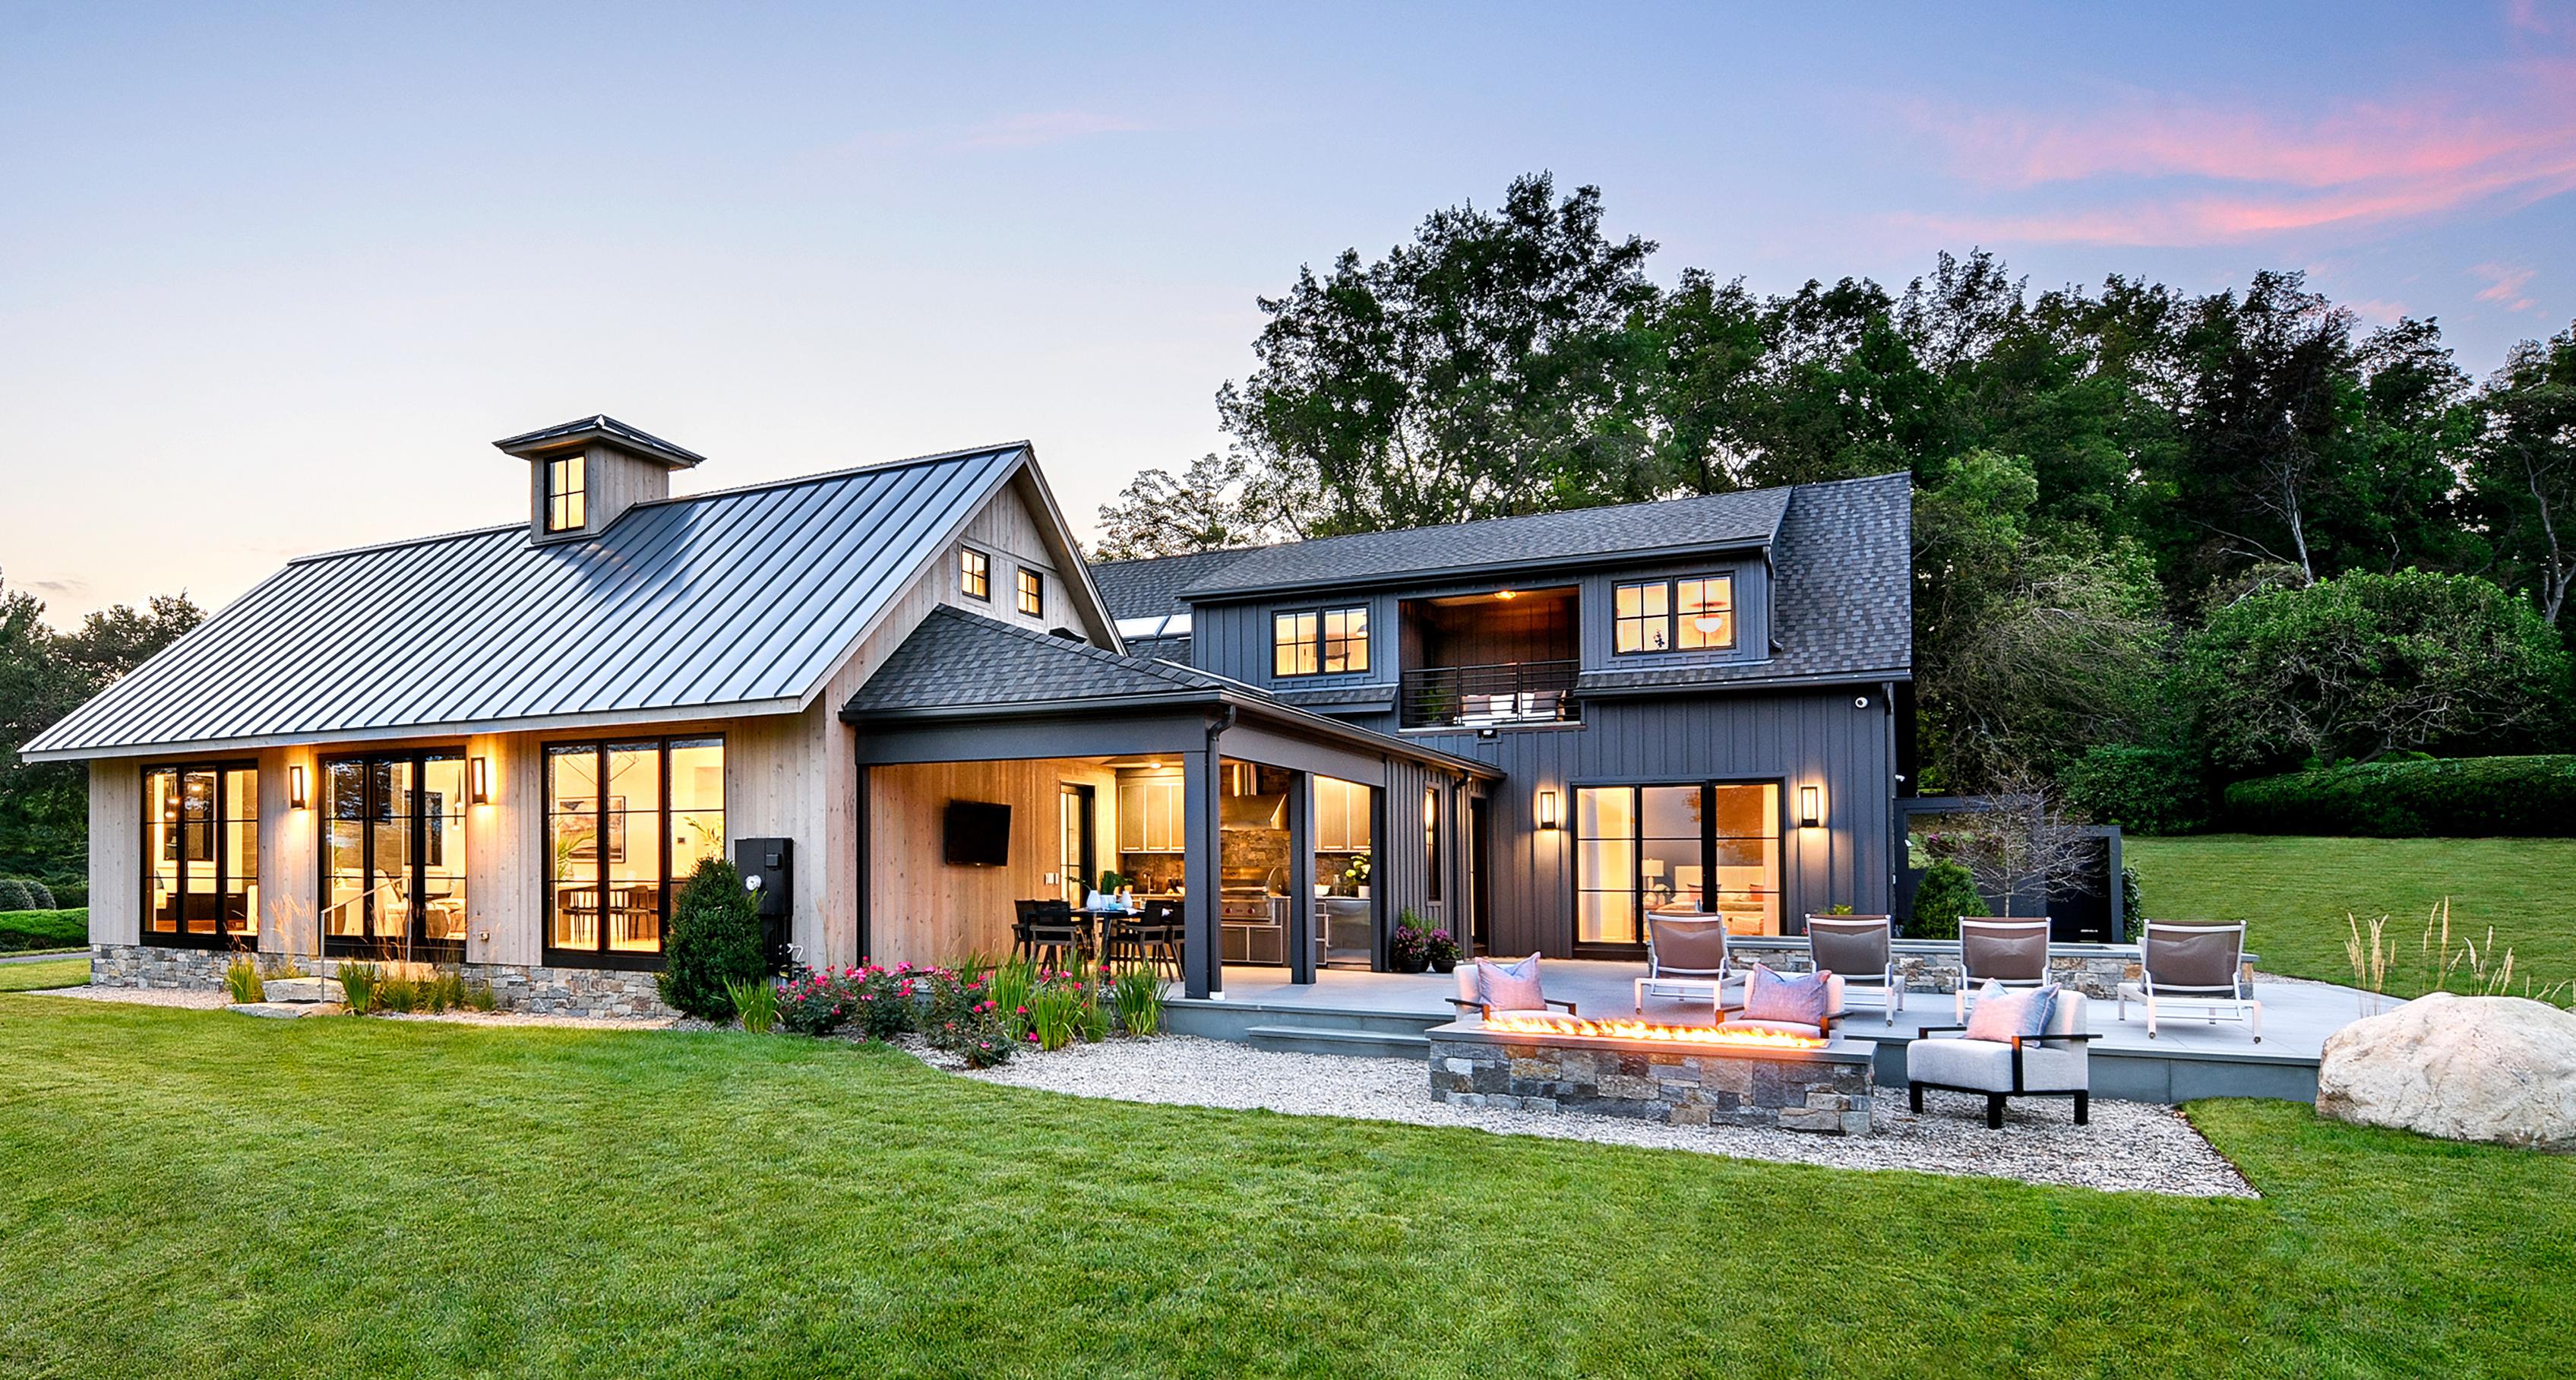 Fairfield Farmhouse, Idea House 2020, exterior evening, Nov/Dec 2020